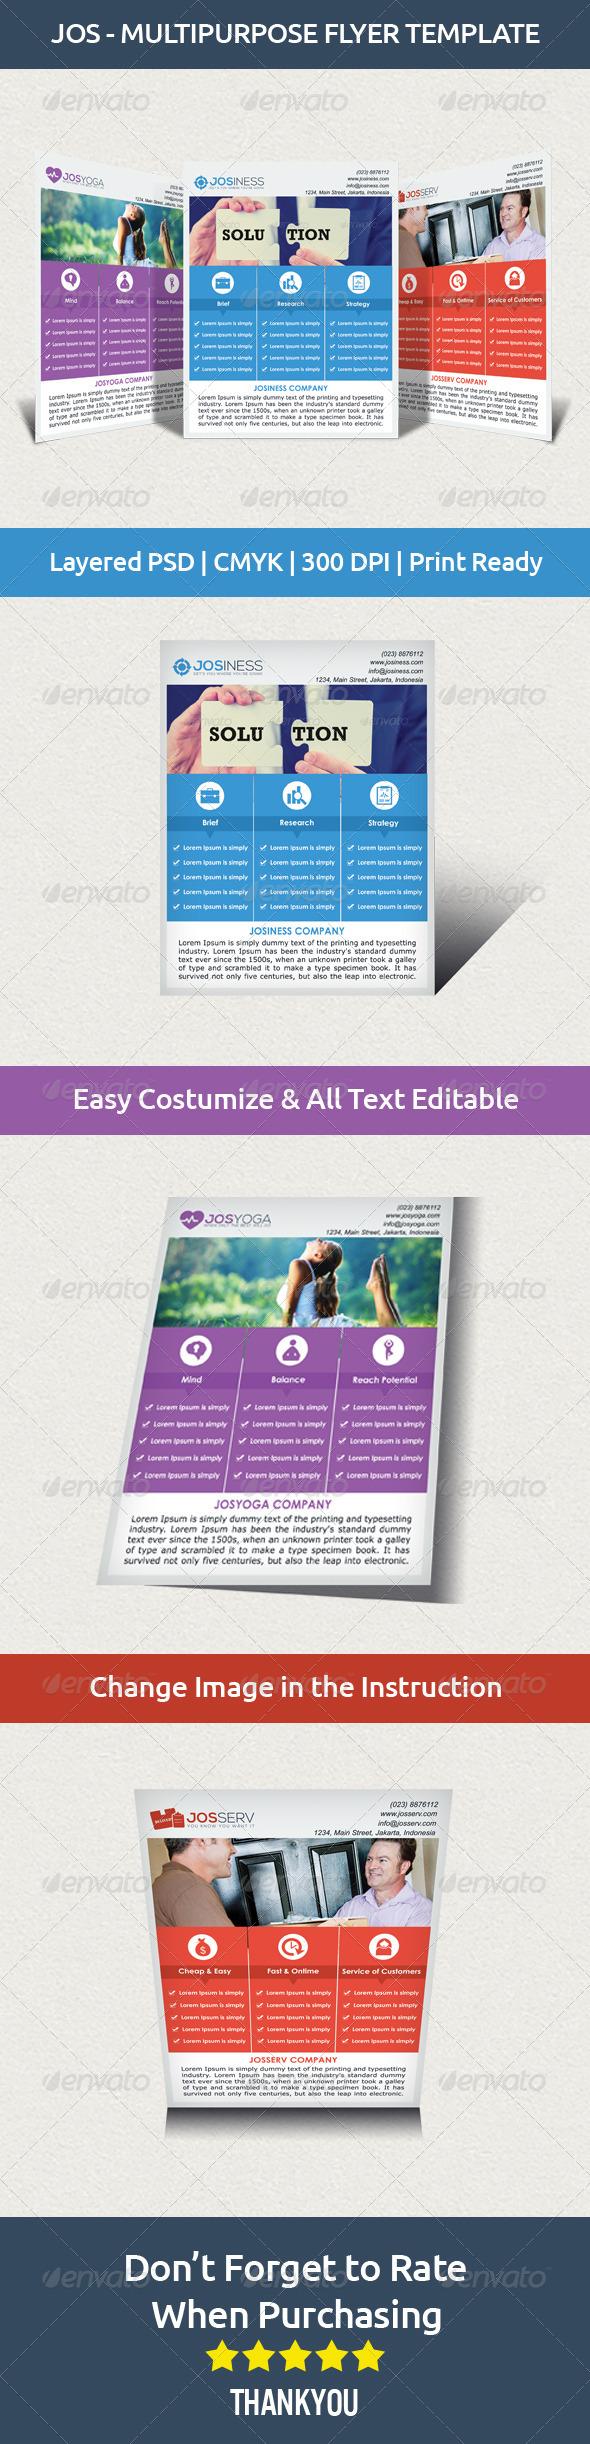 GraphicRiver JOS Multipurpose Flyer Template 7187938